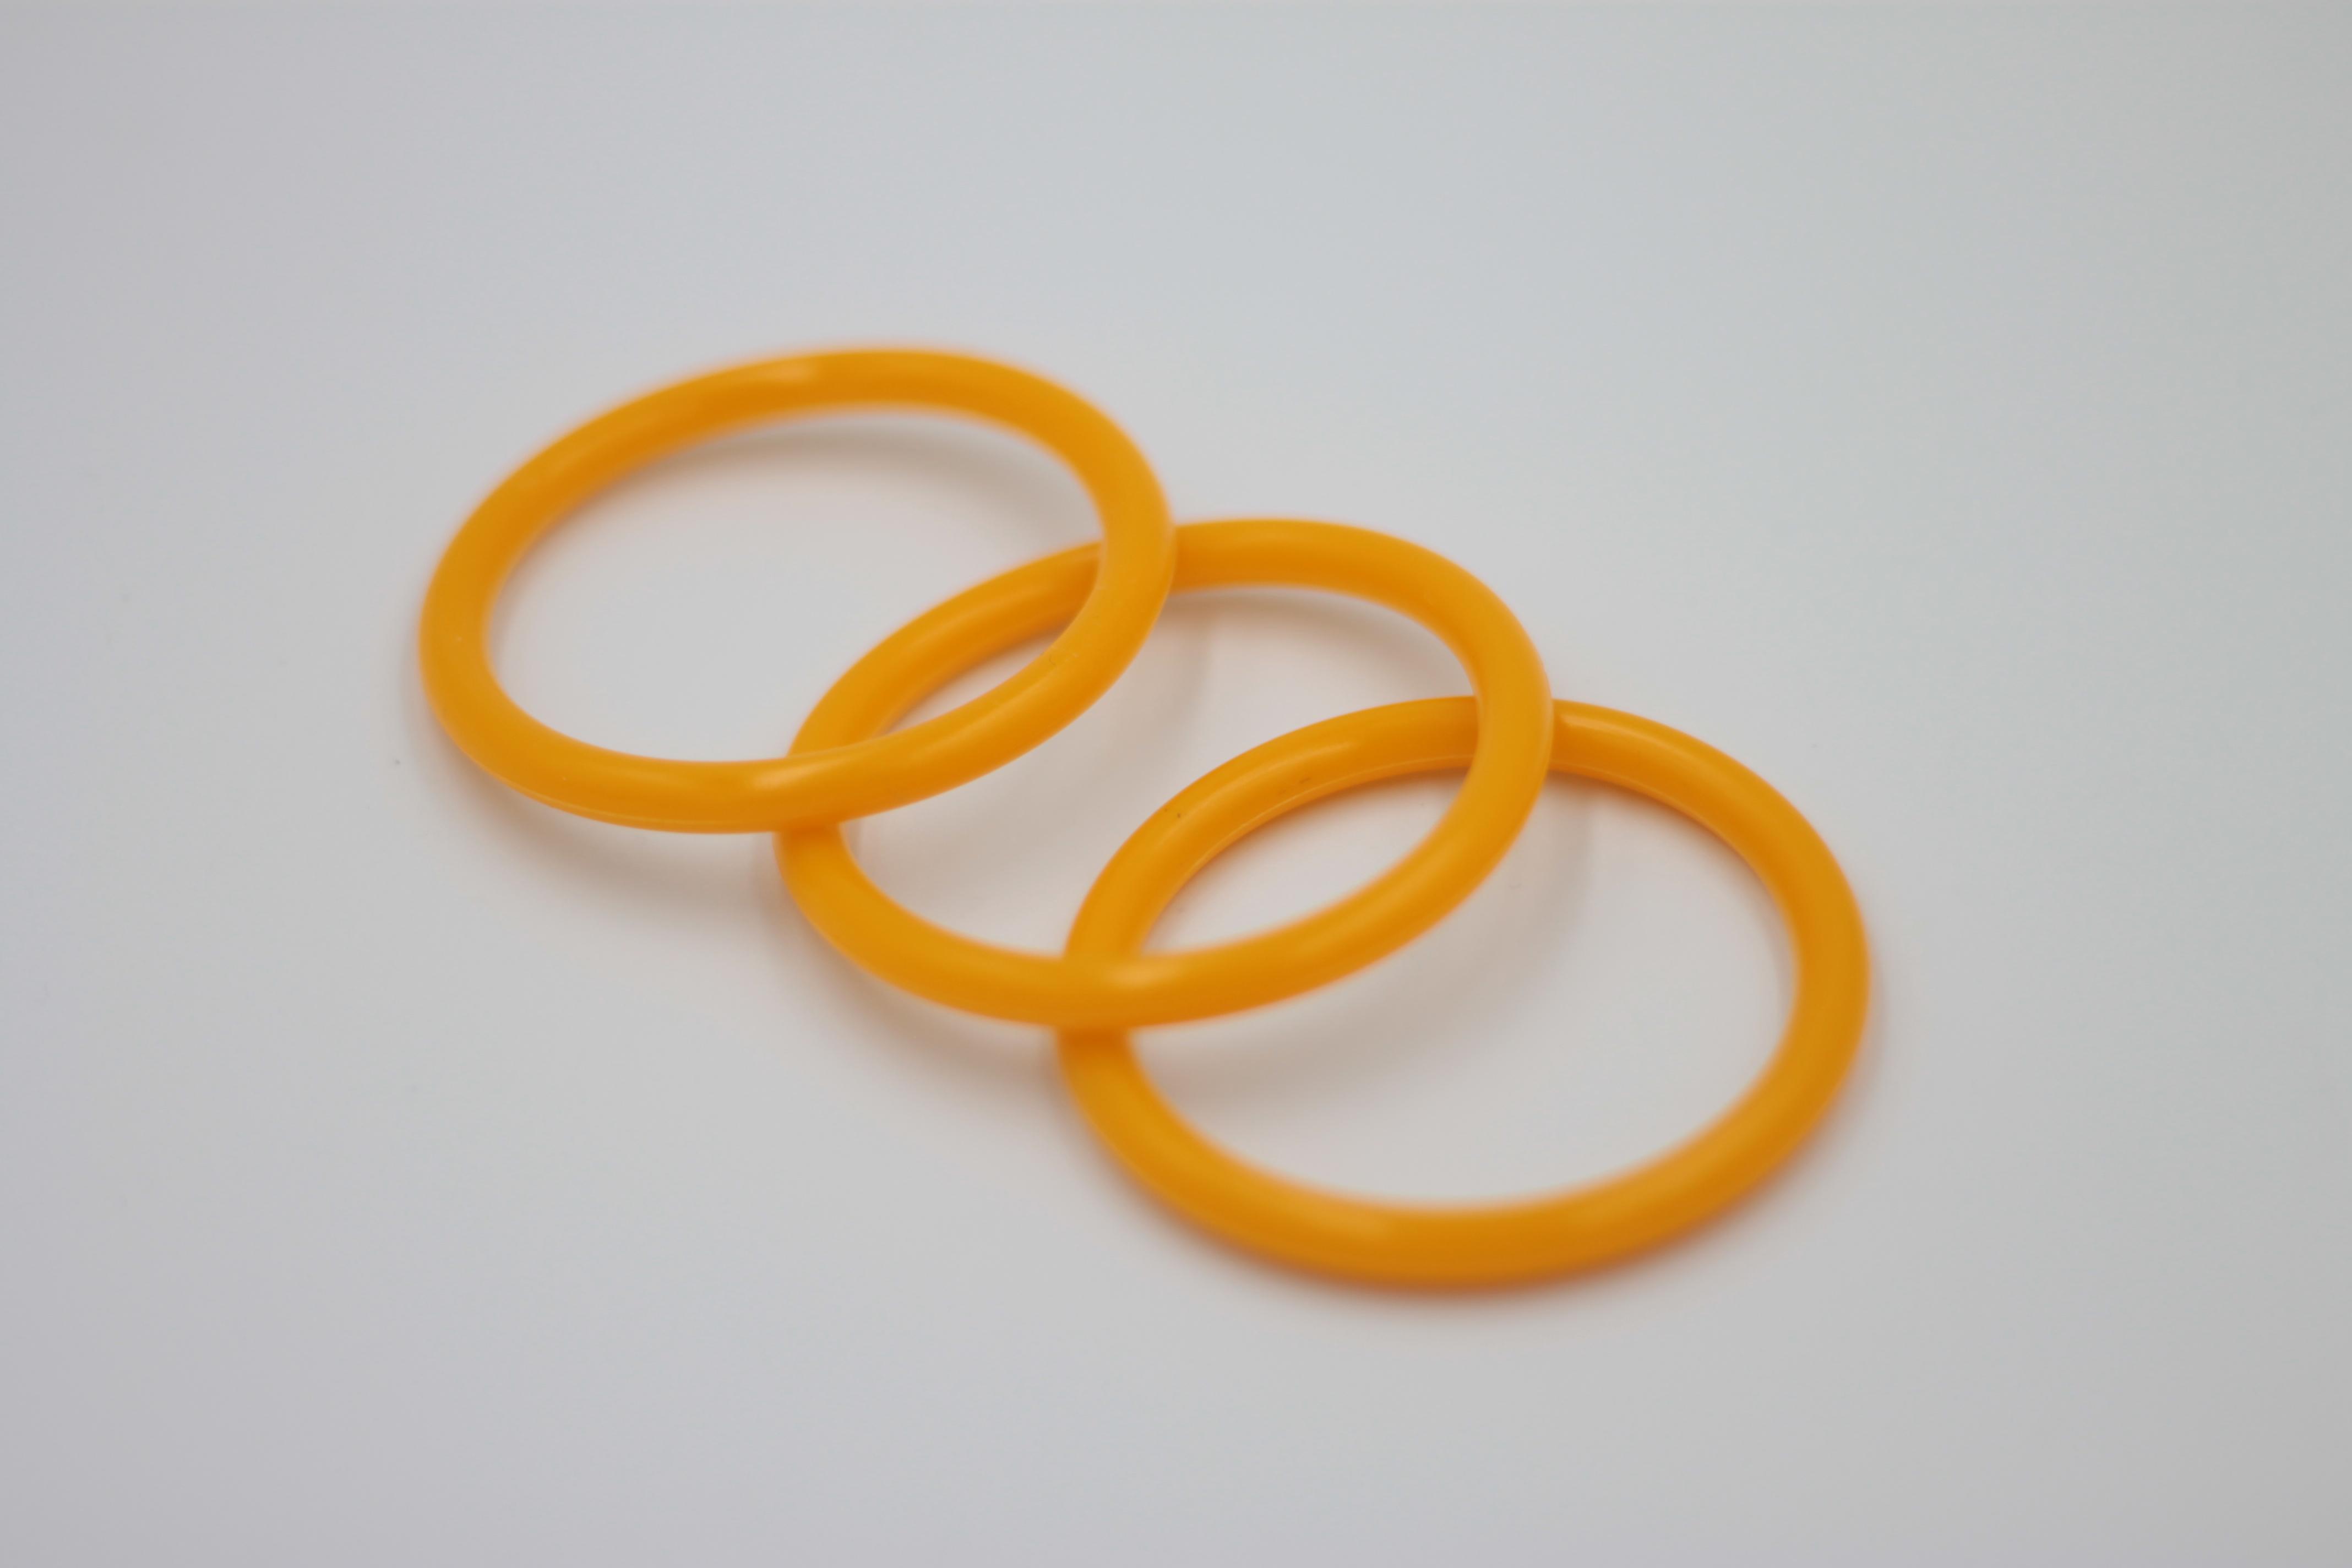 La Pavoni Lever Special orange silicone Filterholder Gasket for pre mills